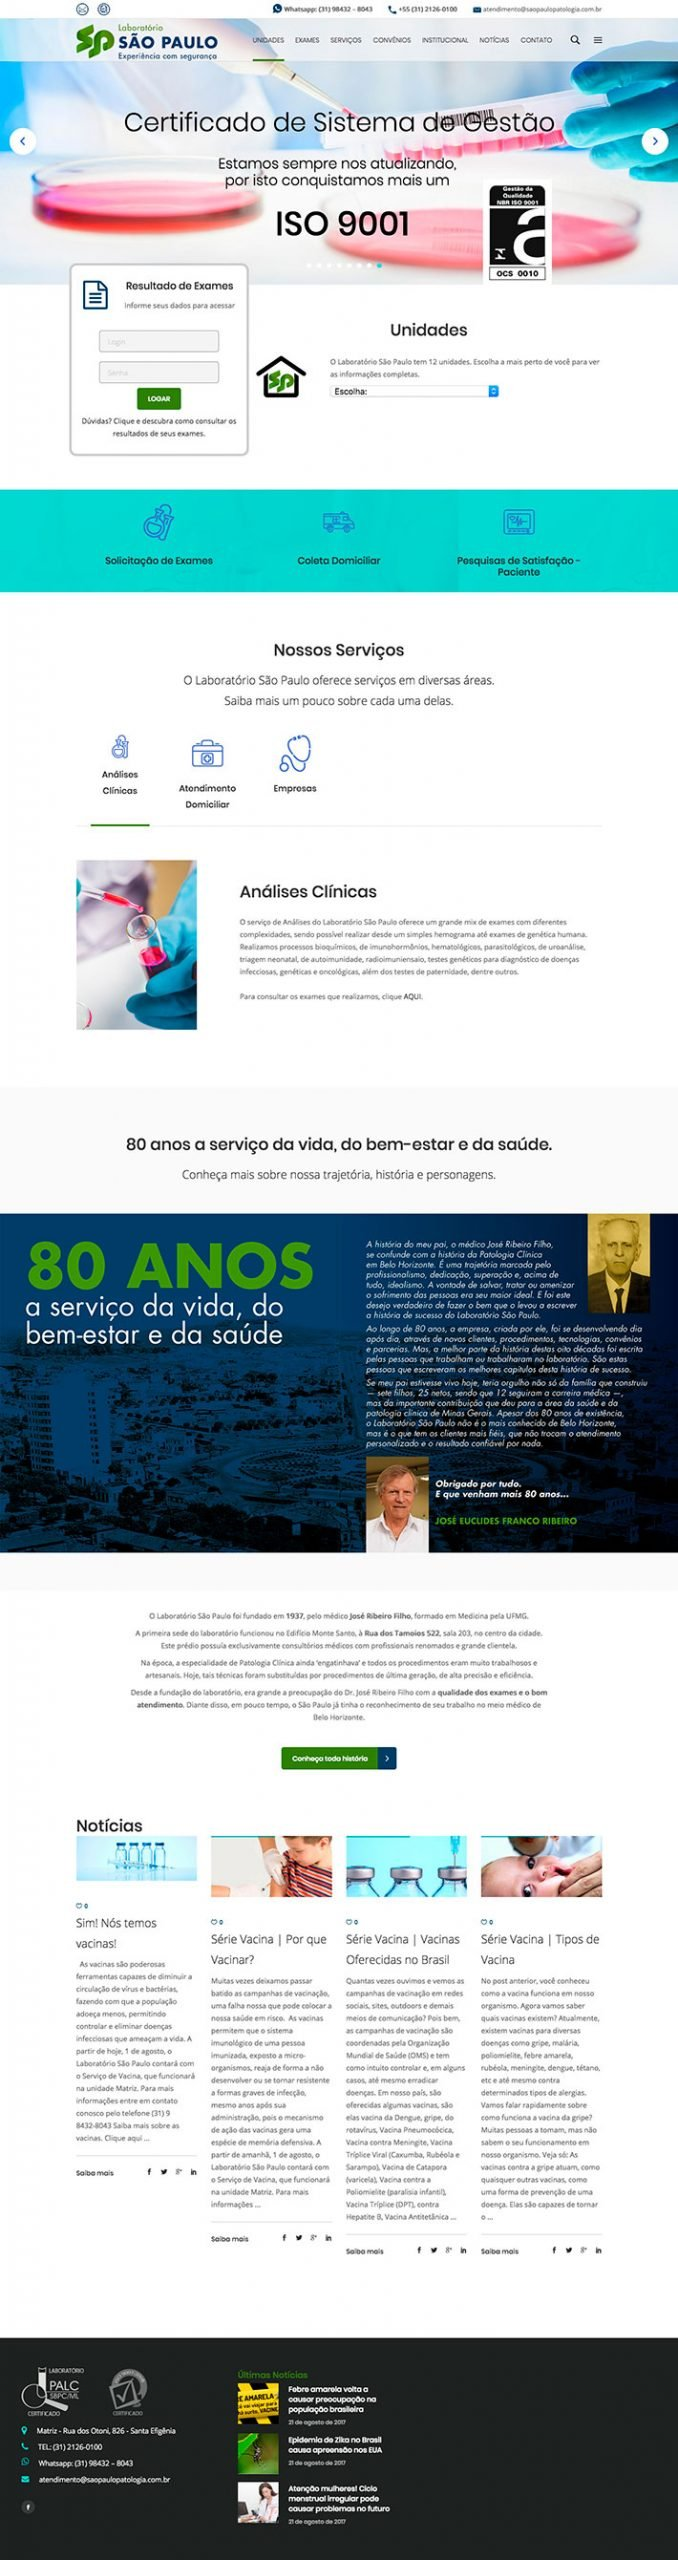 Laboratorio Sao Paulo scaled Portfolio